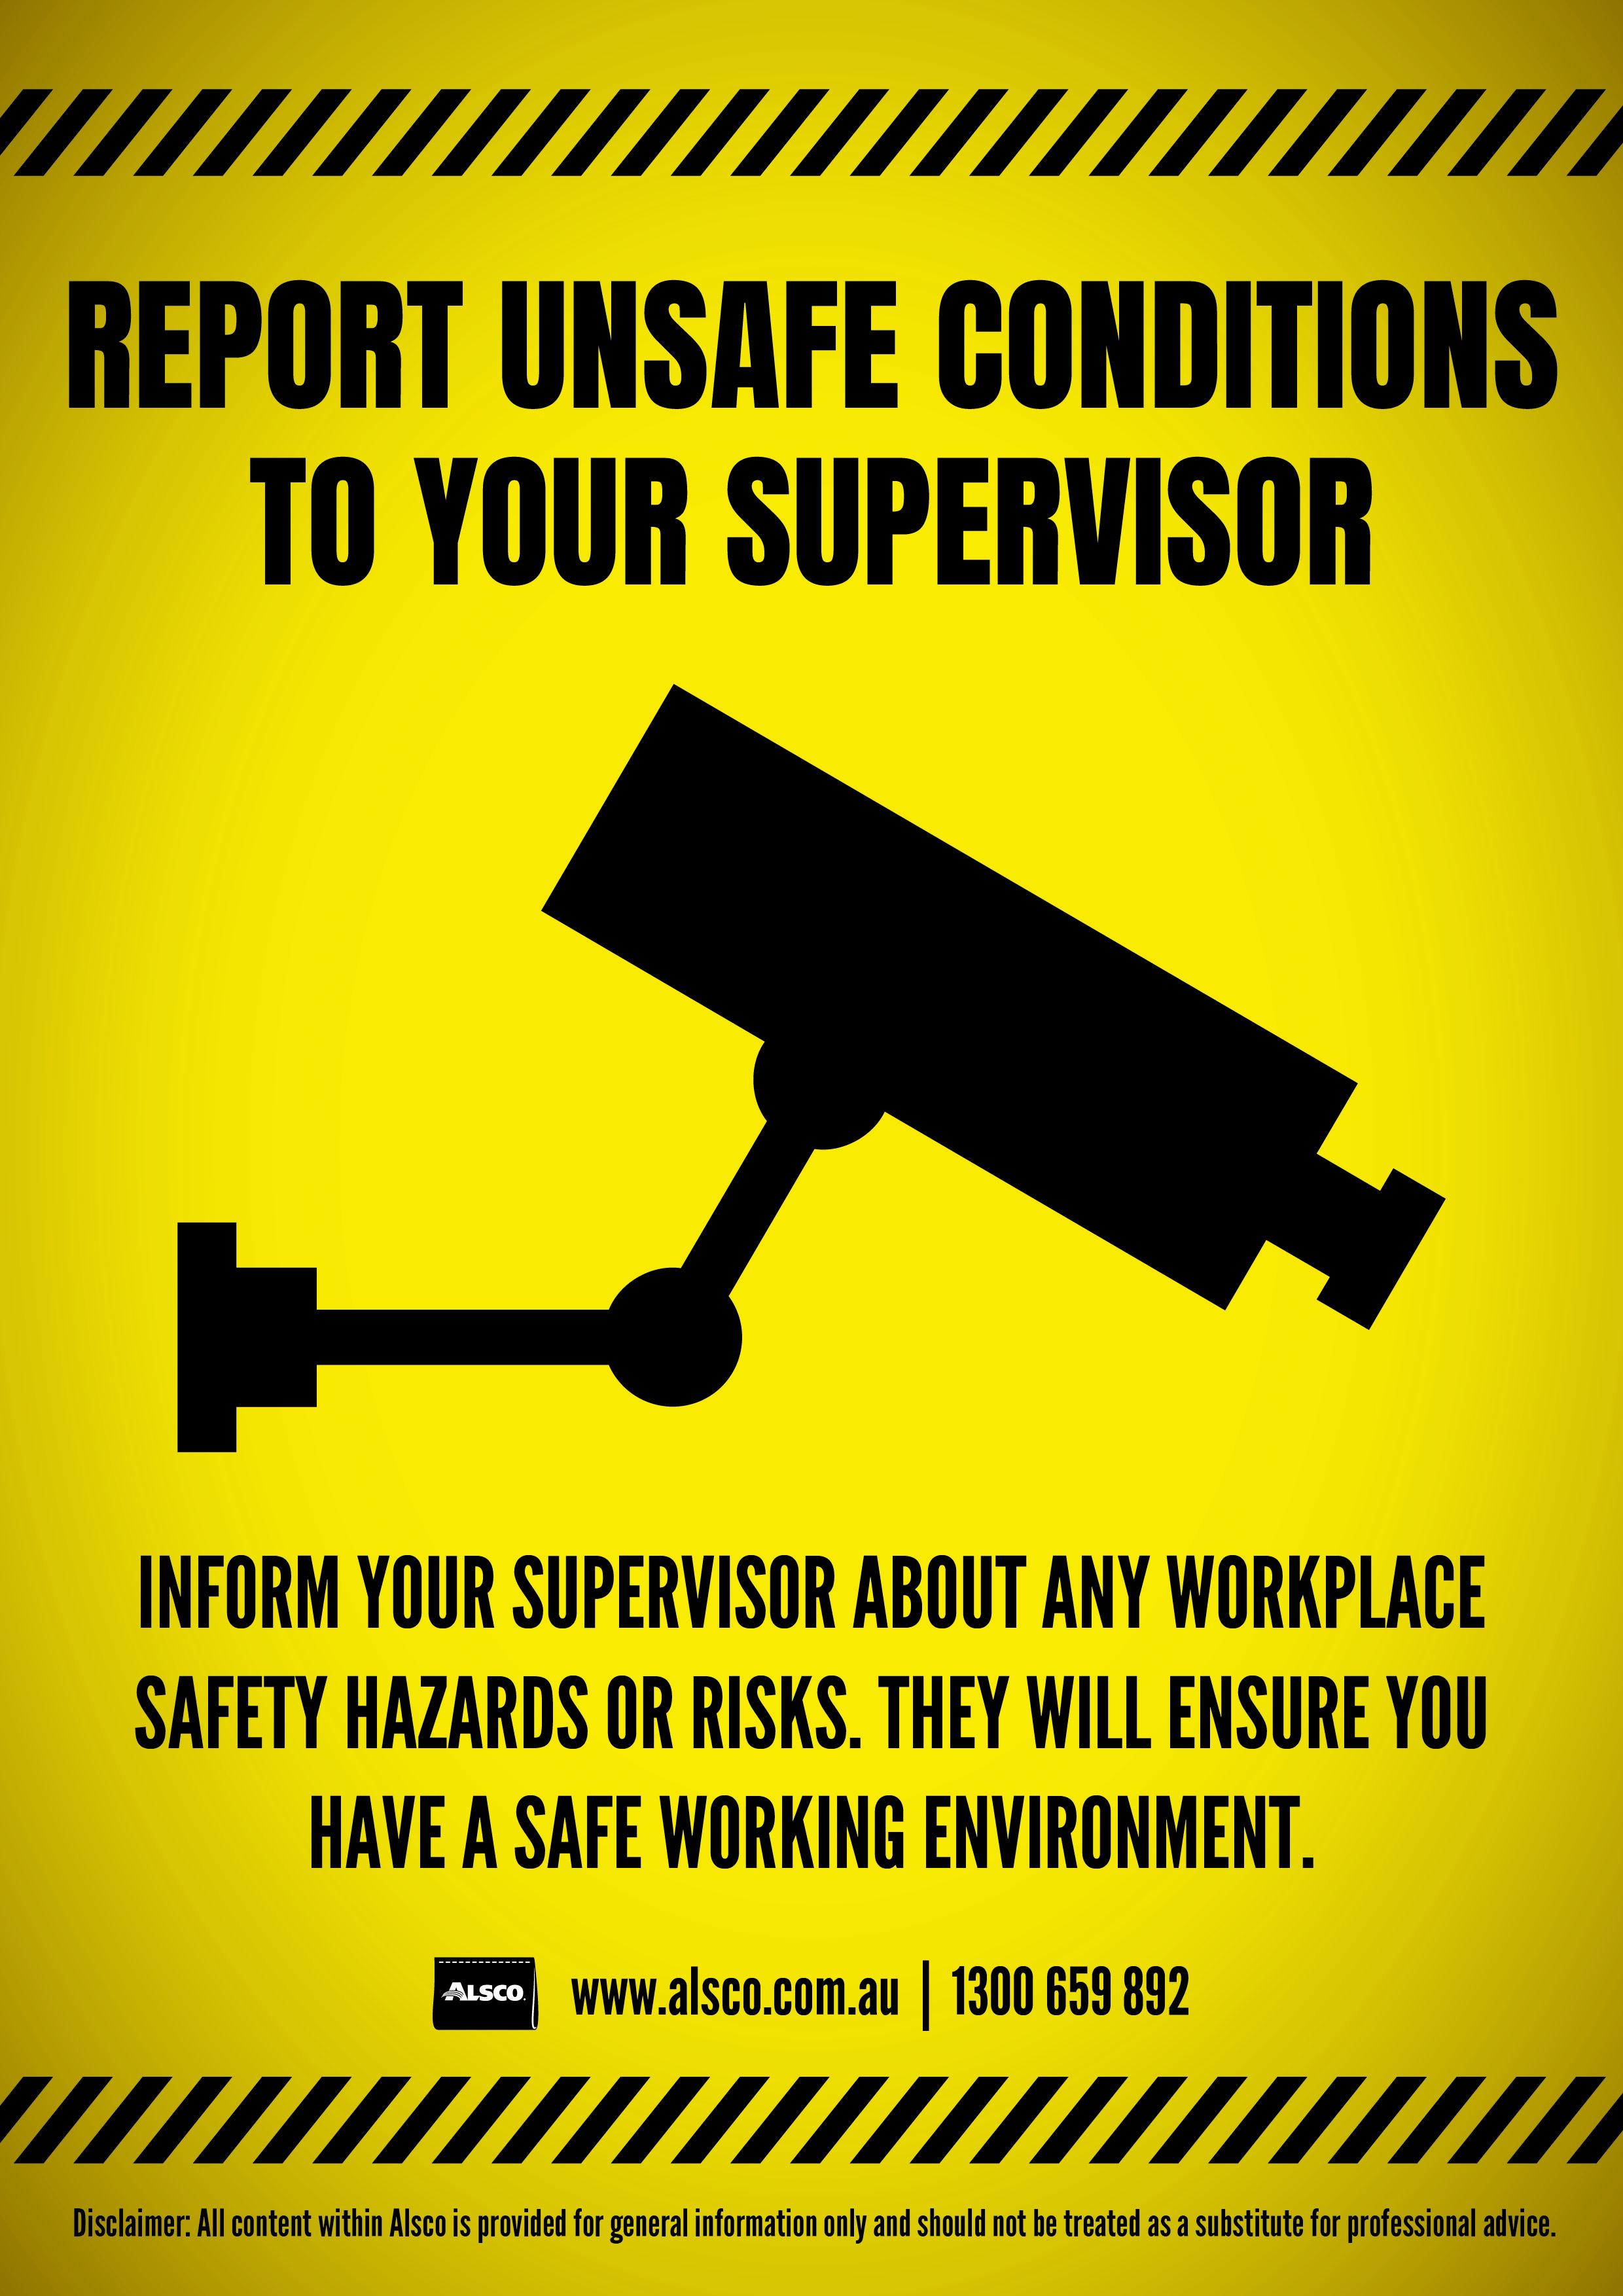 Inform supervisor about any safety hazards or risks